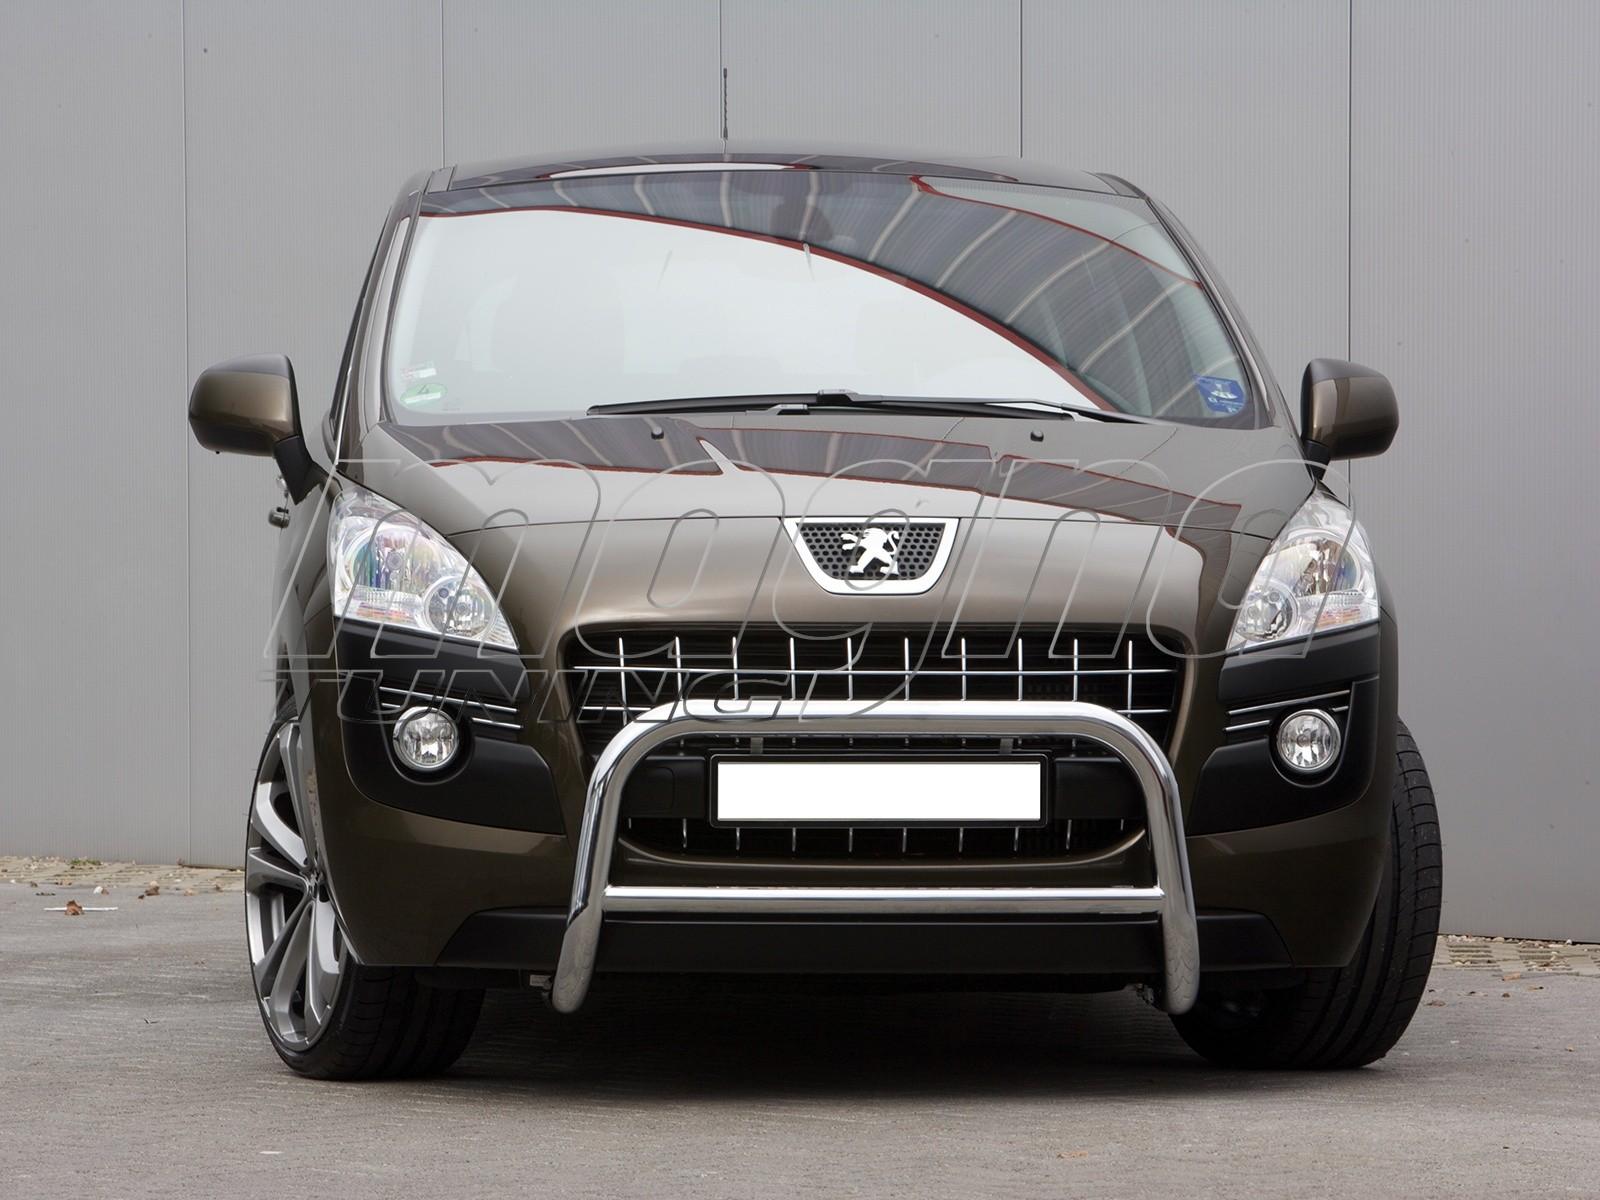 Peugeot 3008 MK1 Bullbar Mystic